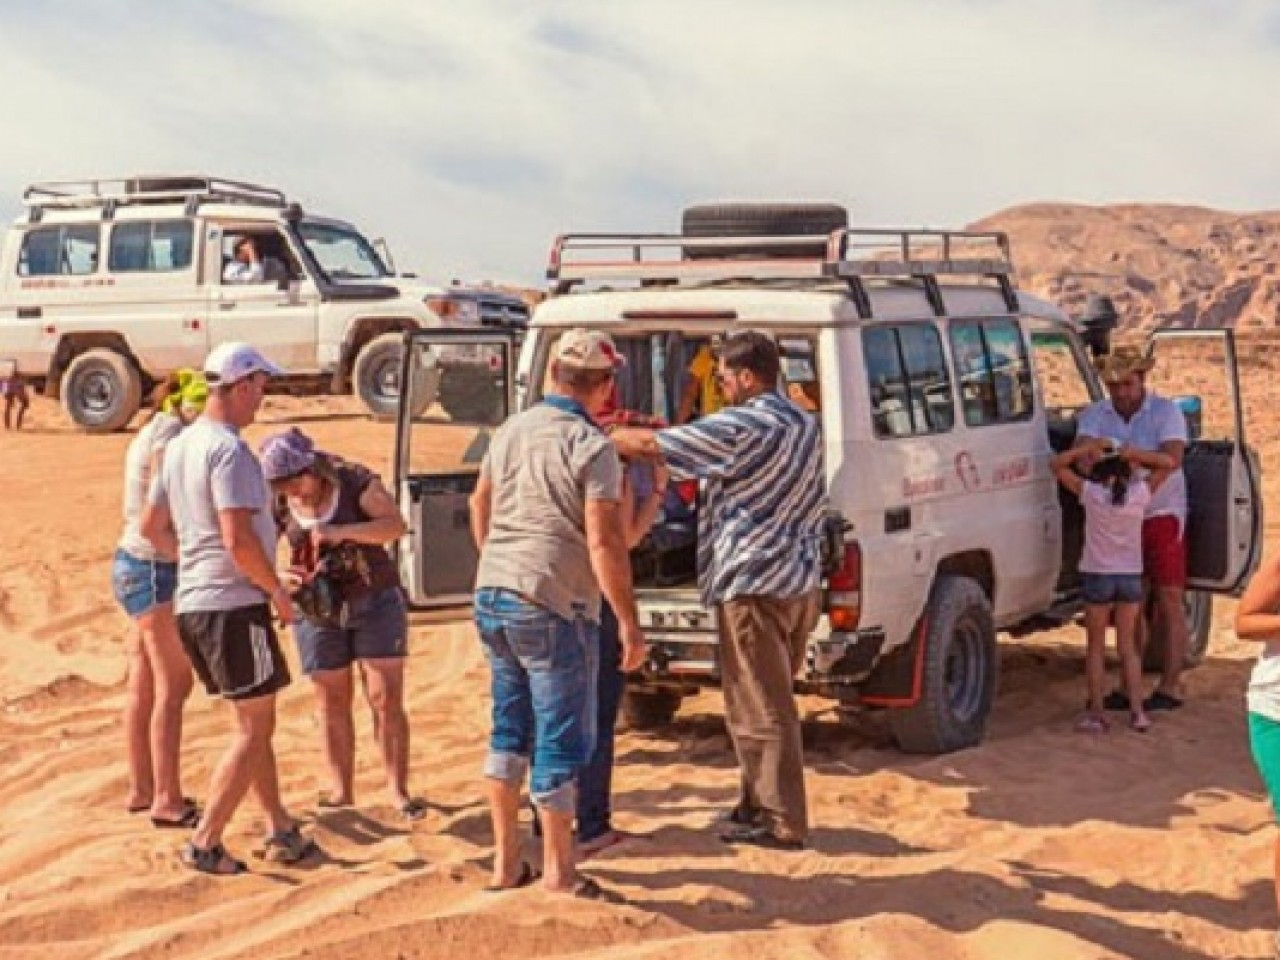 Jeep Safari, Camel Rides, Bedouin Village and BBQ